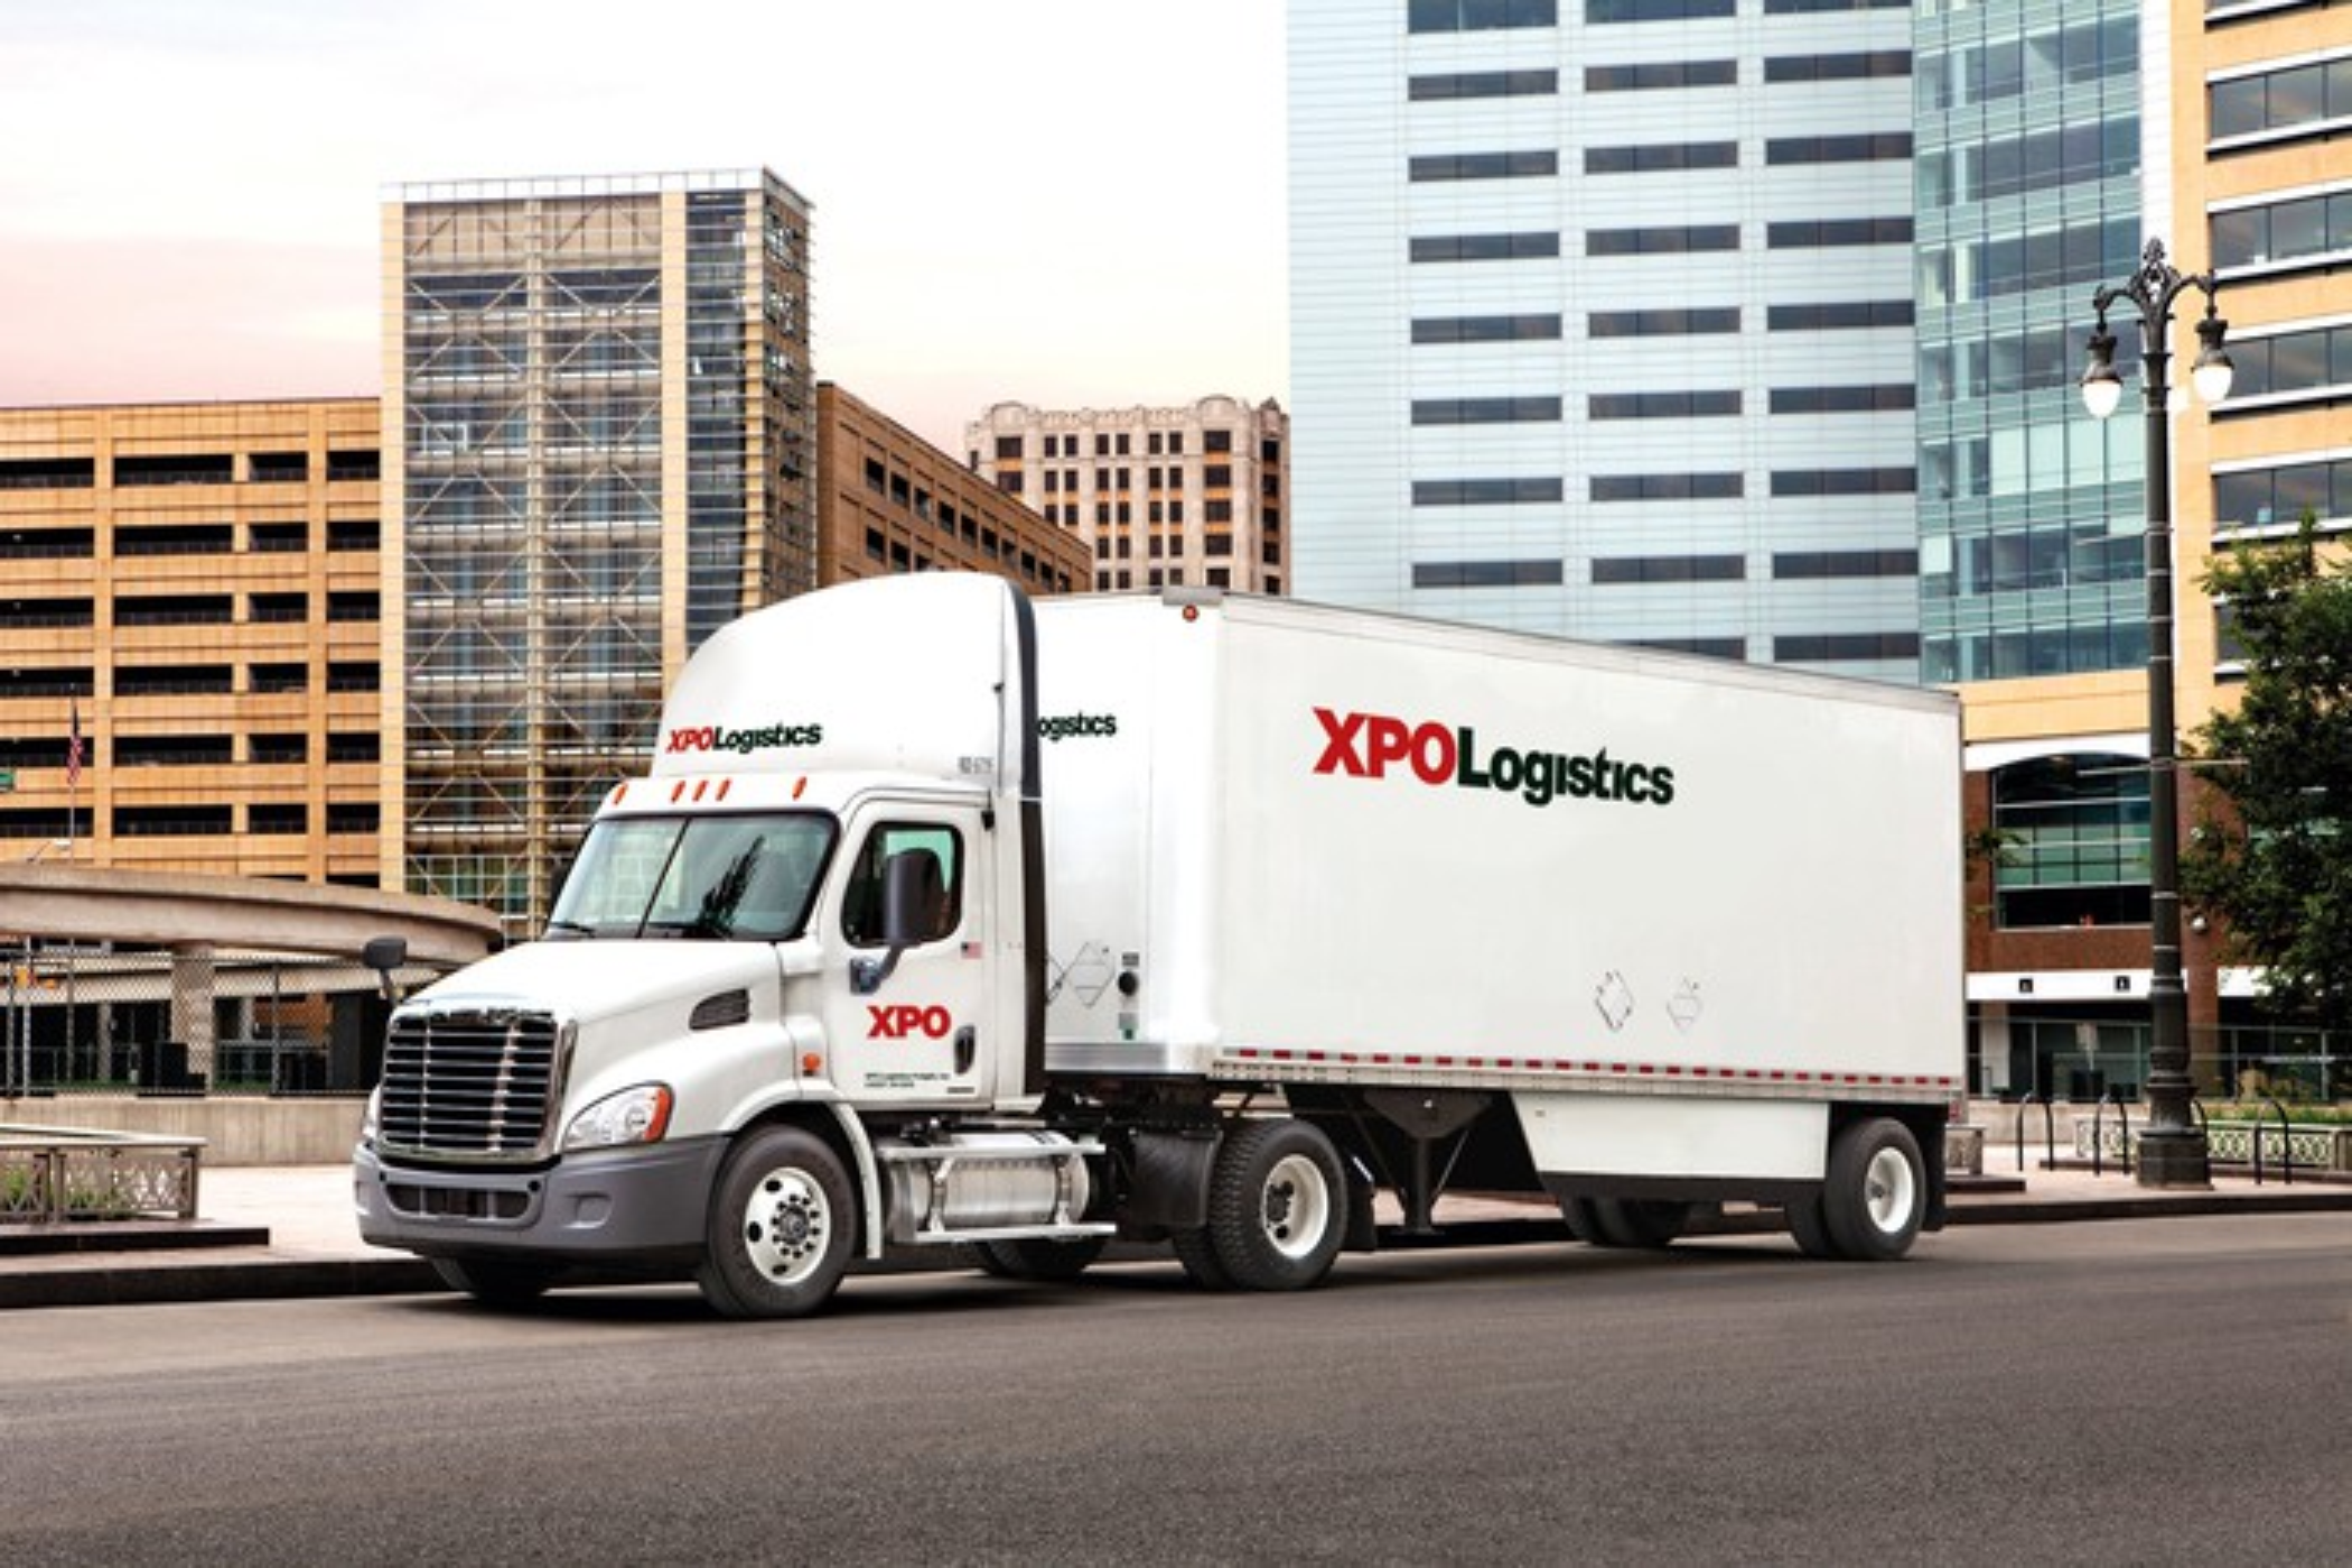 An XPO truck driving through a city.